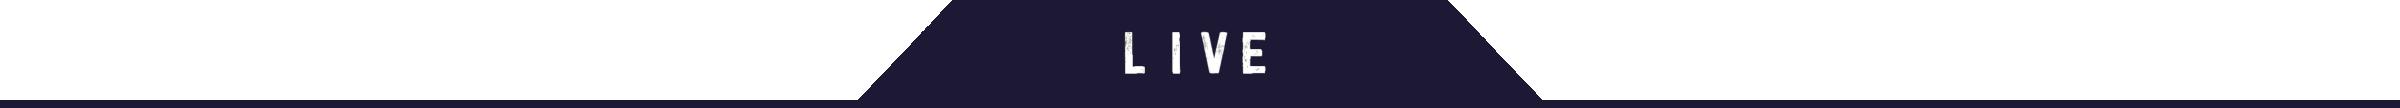 live program